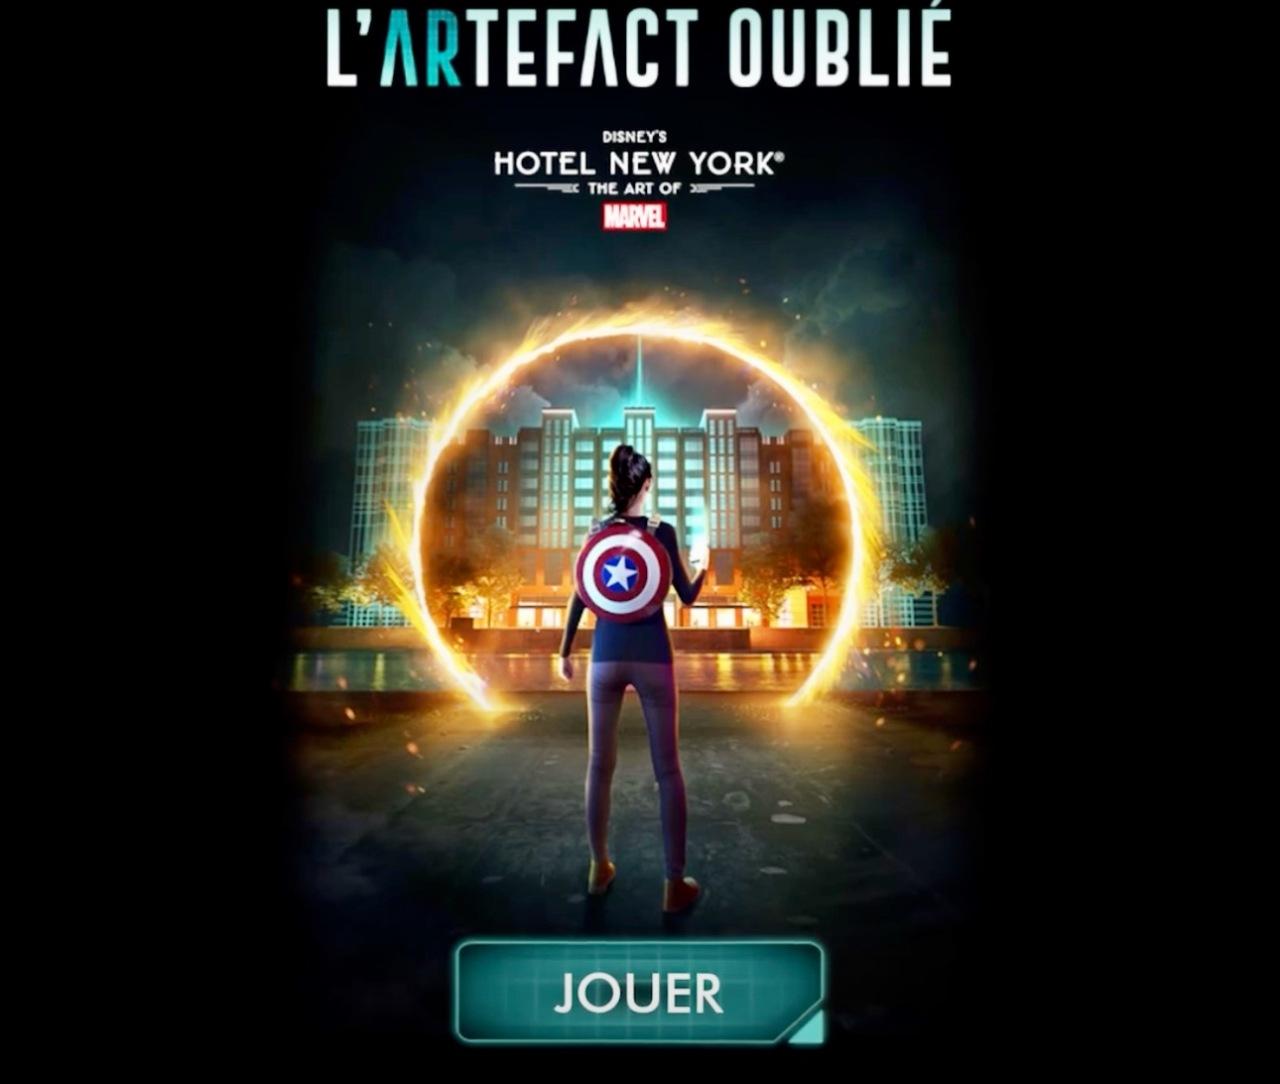 Disneyland Paris launches Marvel AR game app forguests